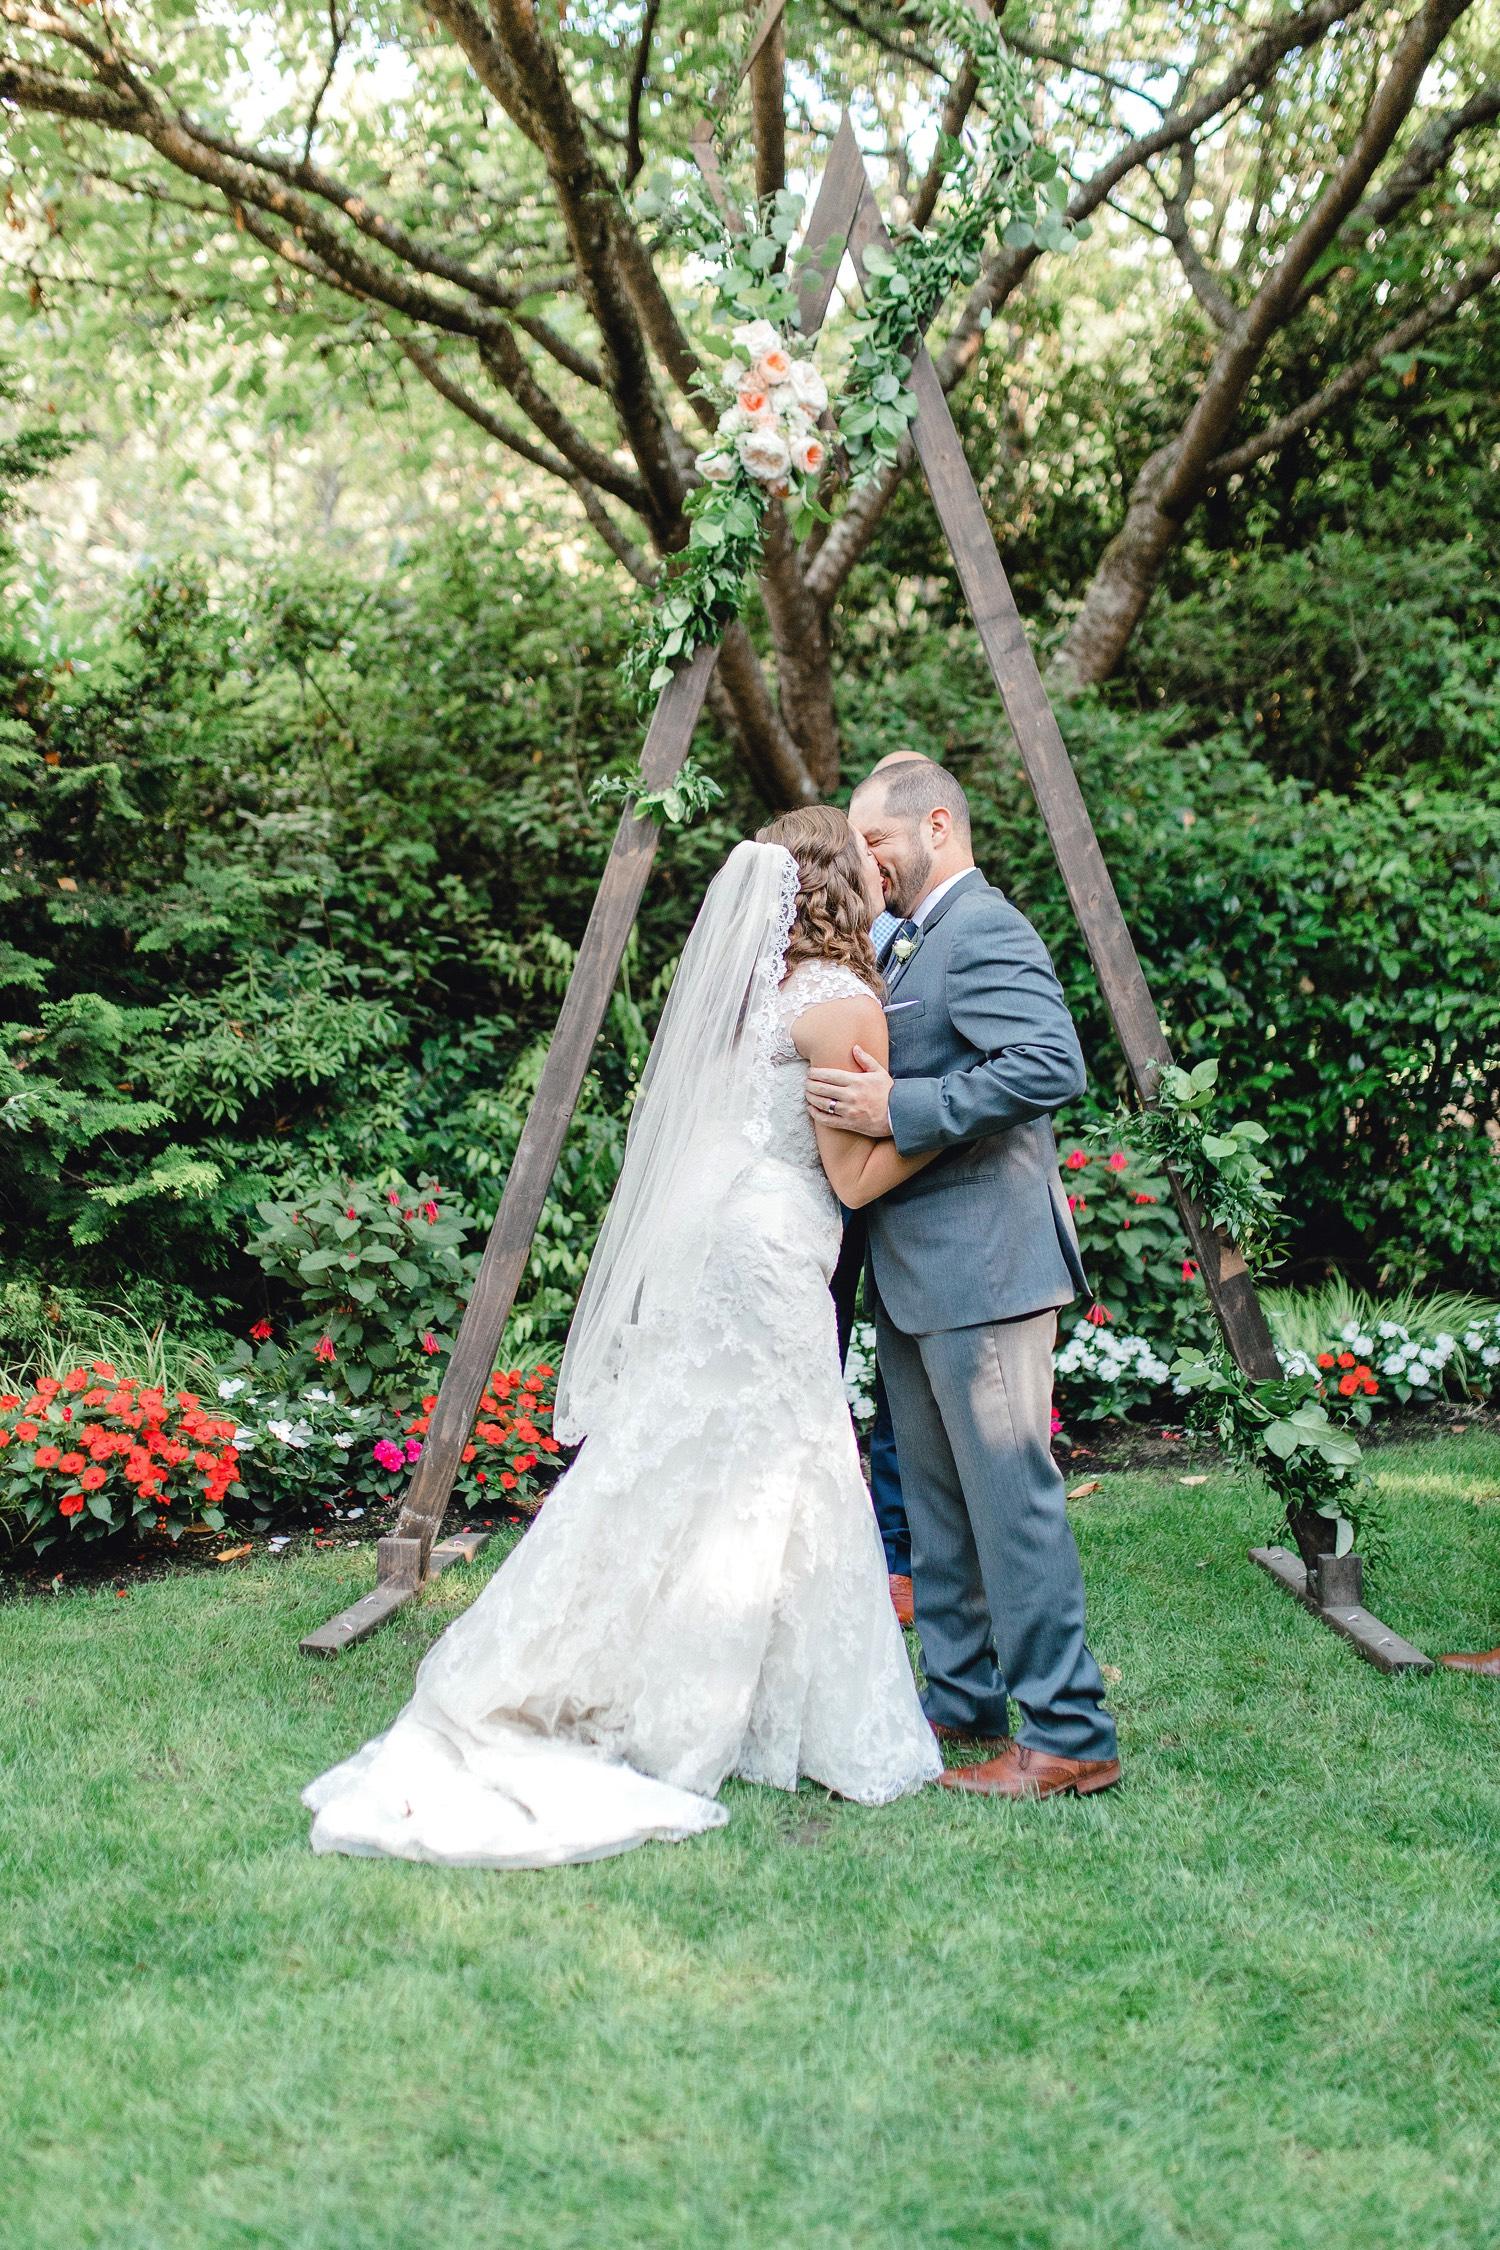 0000000000056_emmarosecompany_katiematt-3412_Photographer_PNW_House_Robinswood_Emma_Light_Company_Airy_Rose_and_Wedding_Seattle.jpg